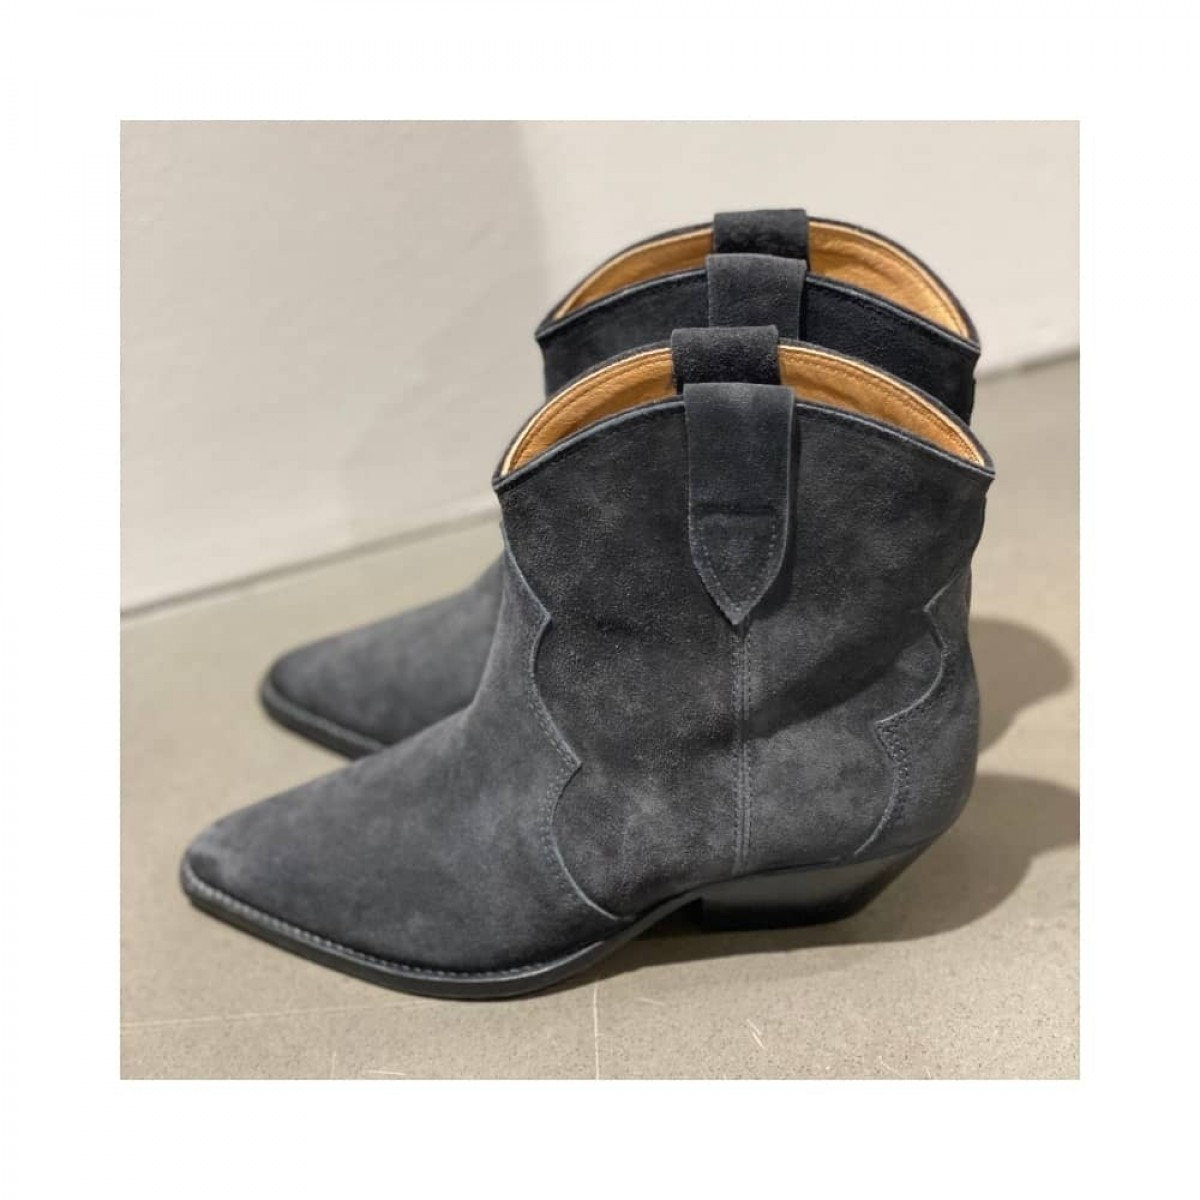 dewina boots - faded black